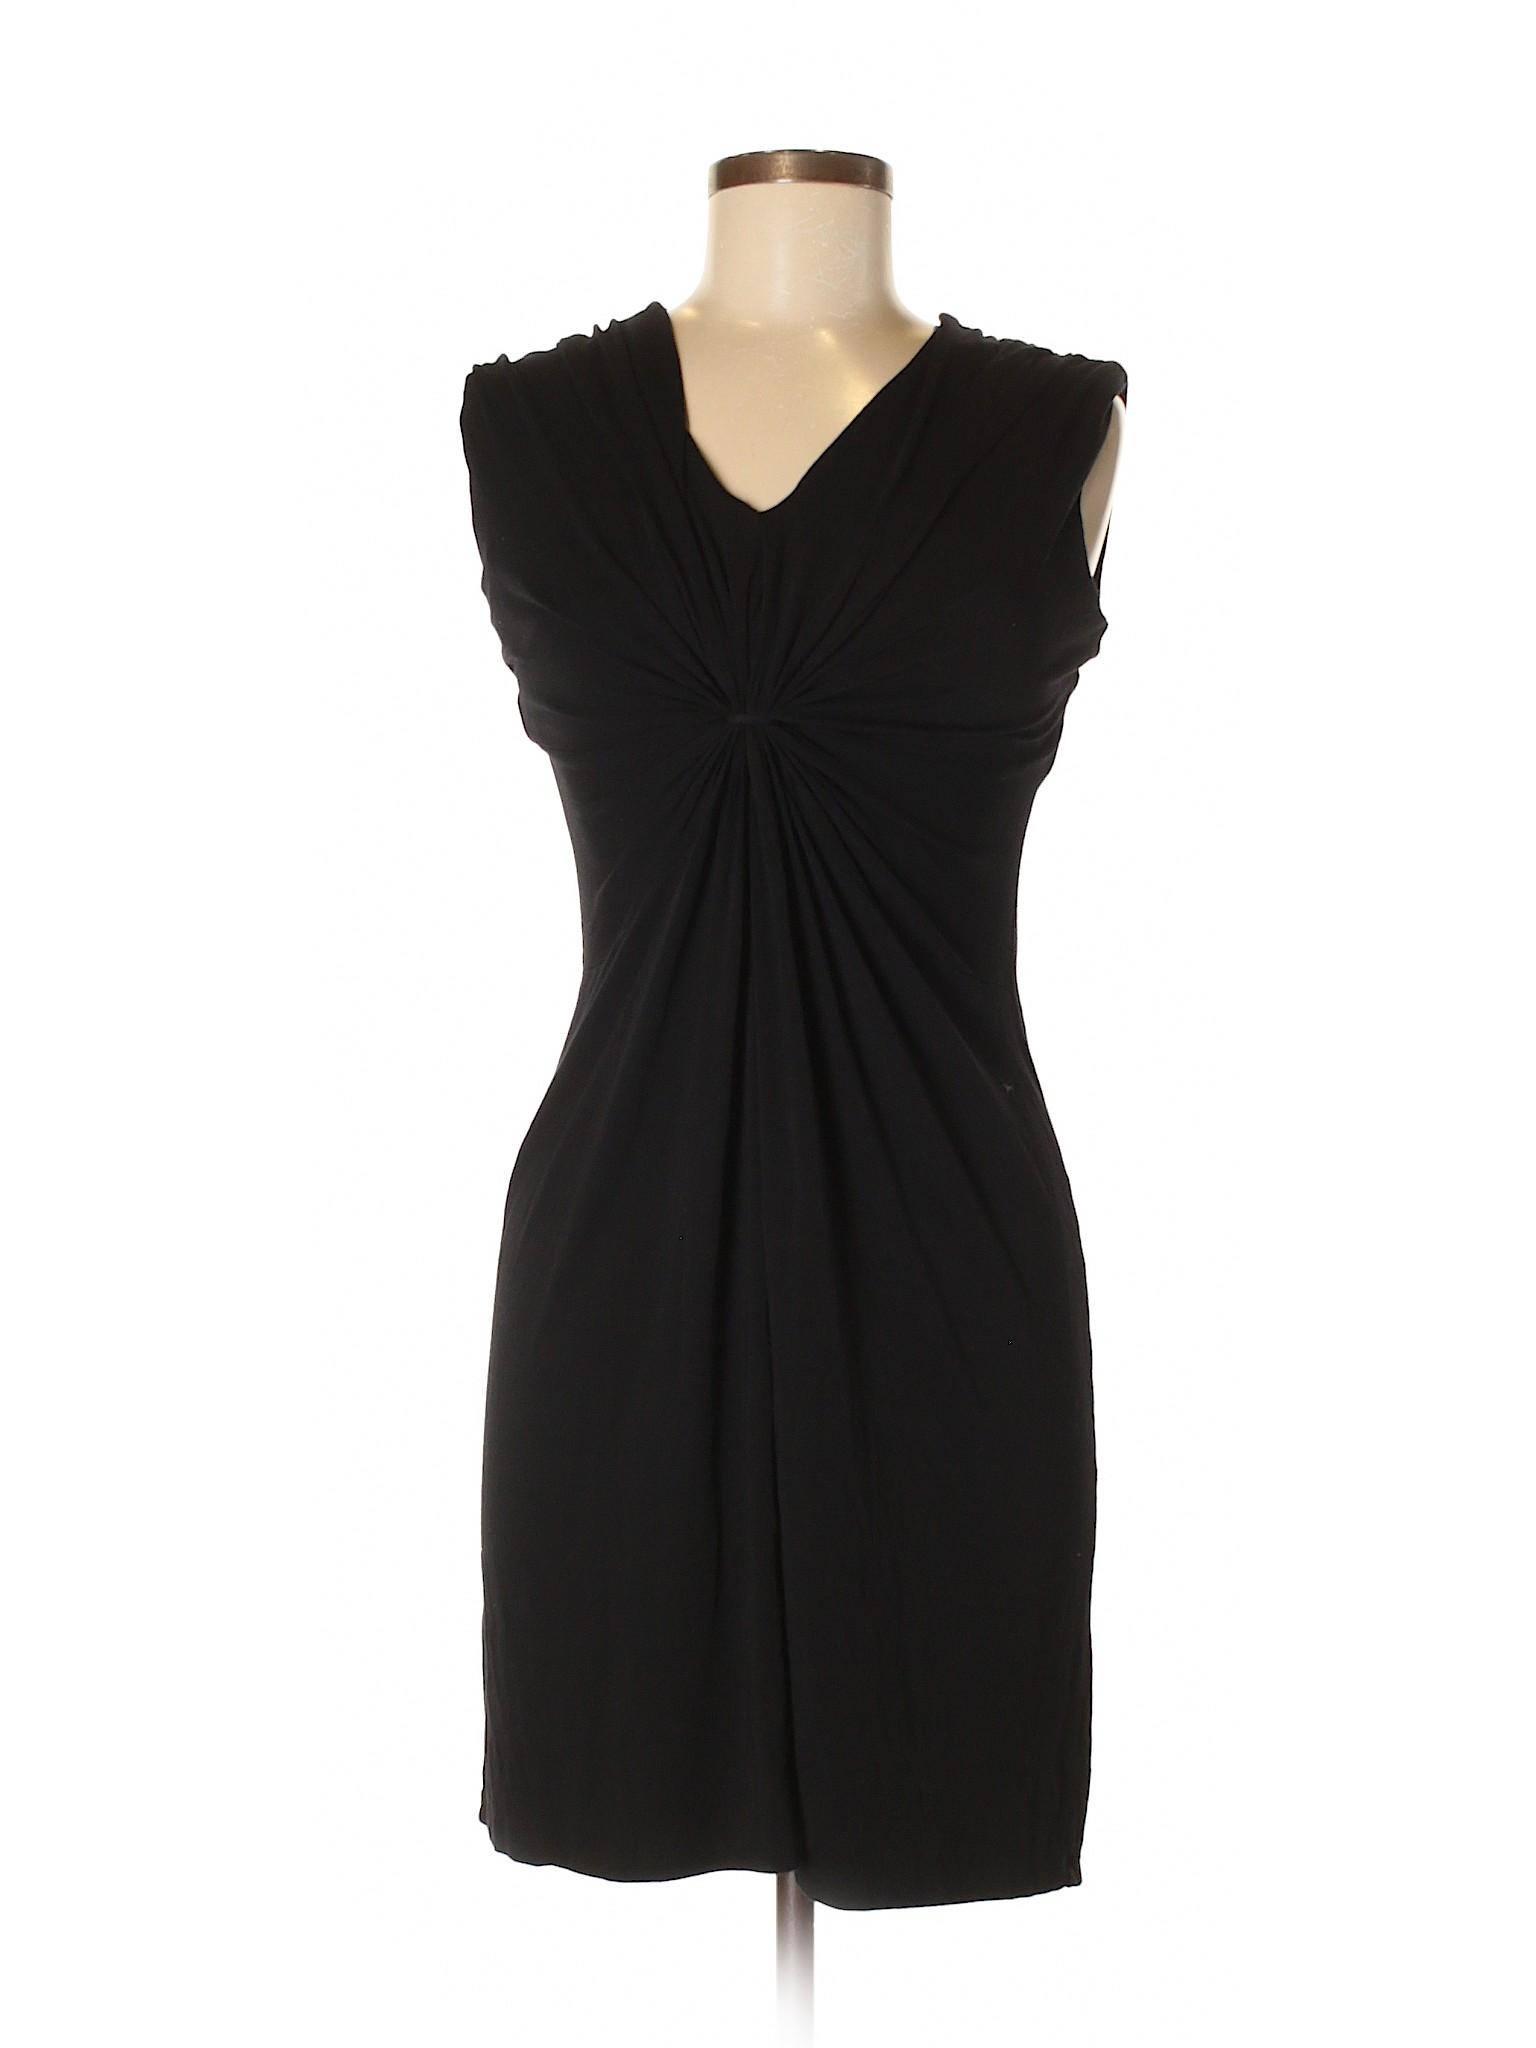 winter Dress Klein Casual Calvin Boutique XvqwxTT